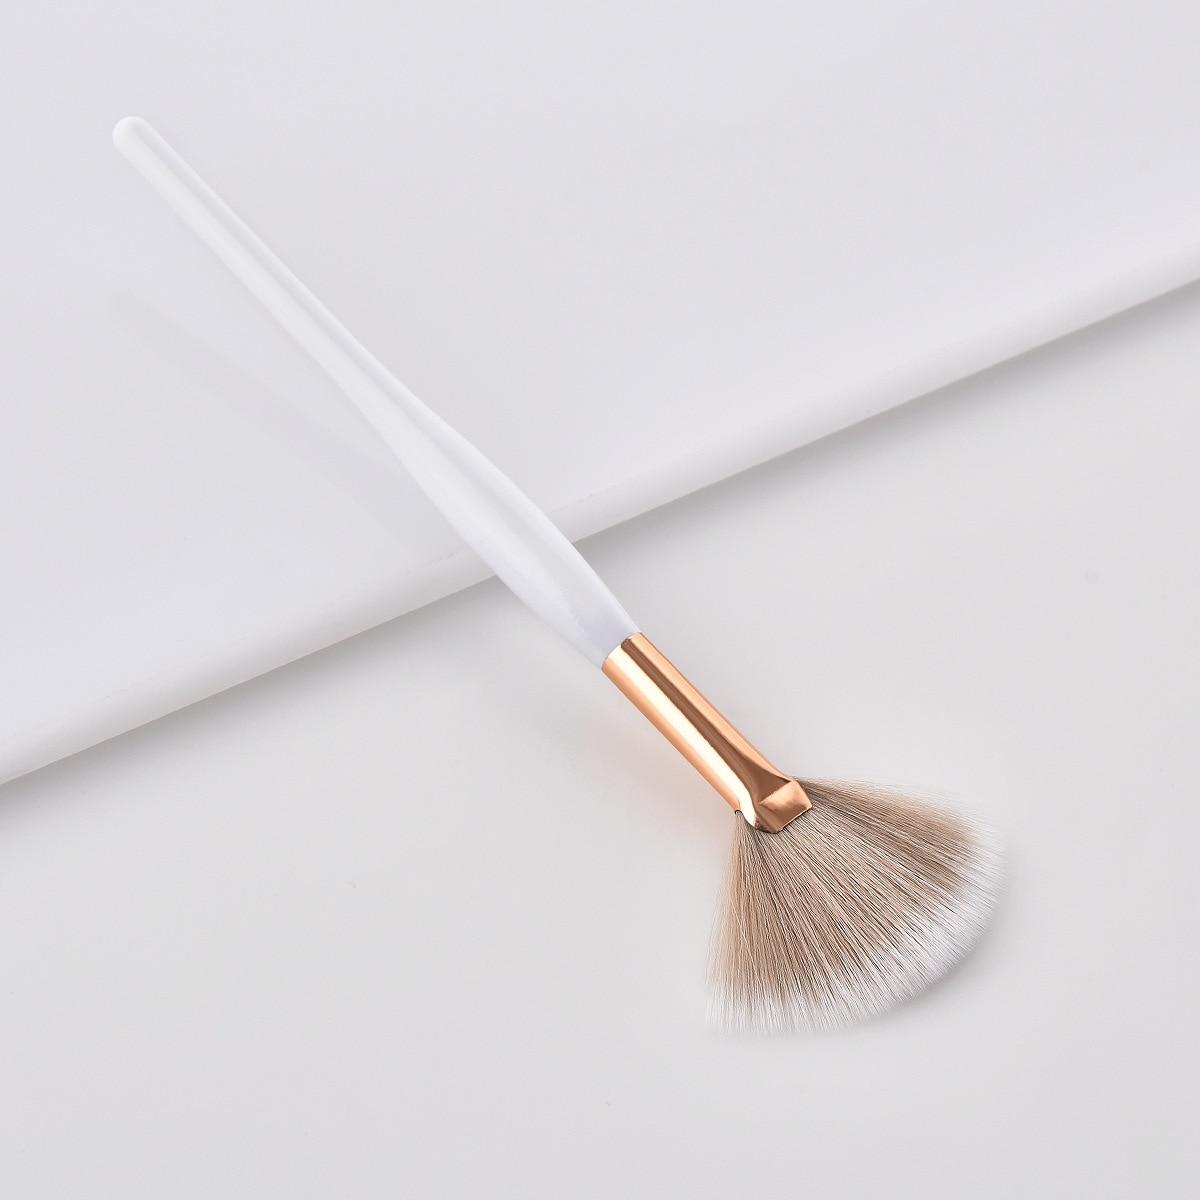 Professional Single Makeup Brushes High Quality Eye Shadow Eyebrow Lip Powder Foundation Make Up Brush Comestic Pencil Brush 2